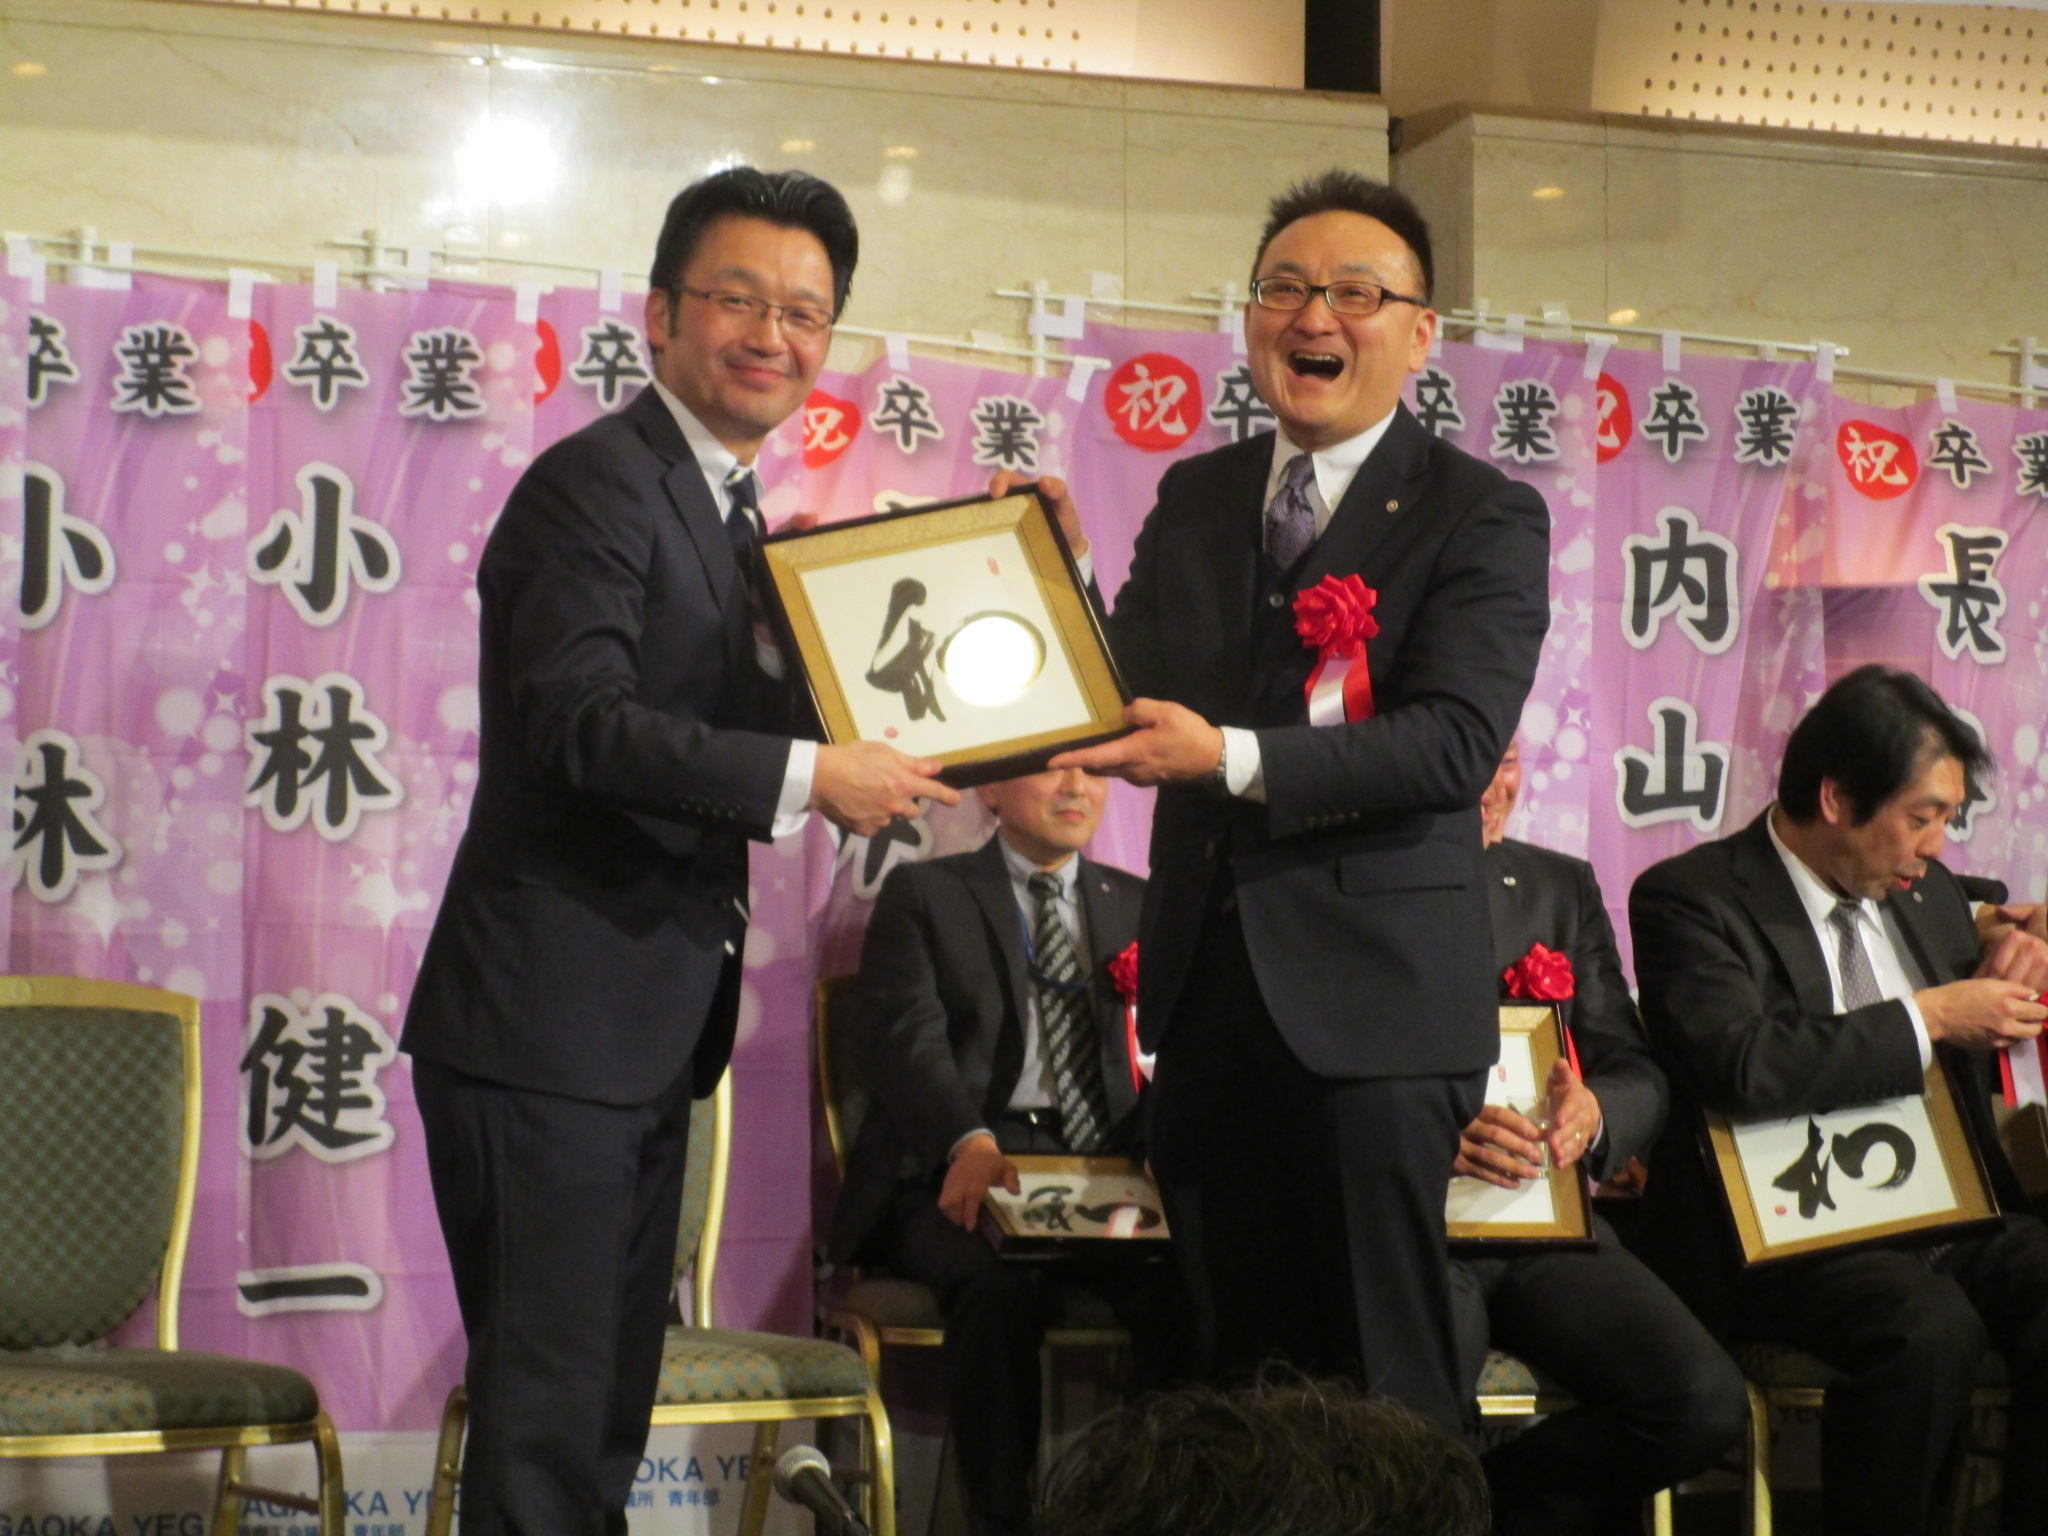 平成29年度3月例会・卒業生を送る会4